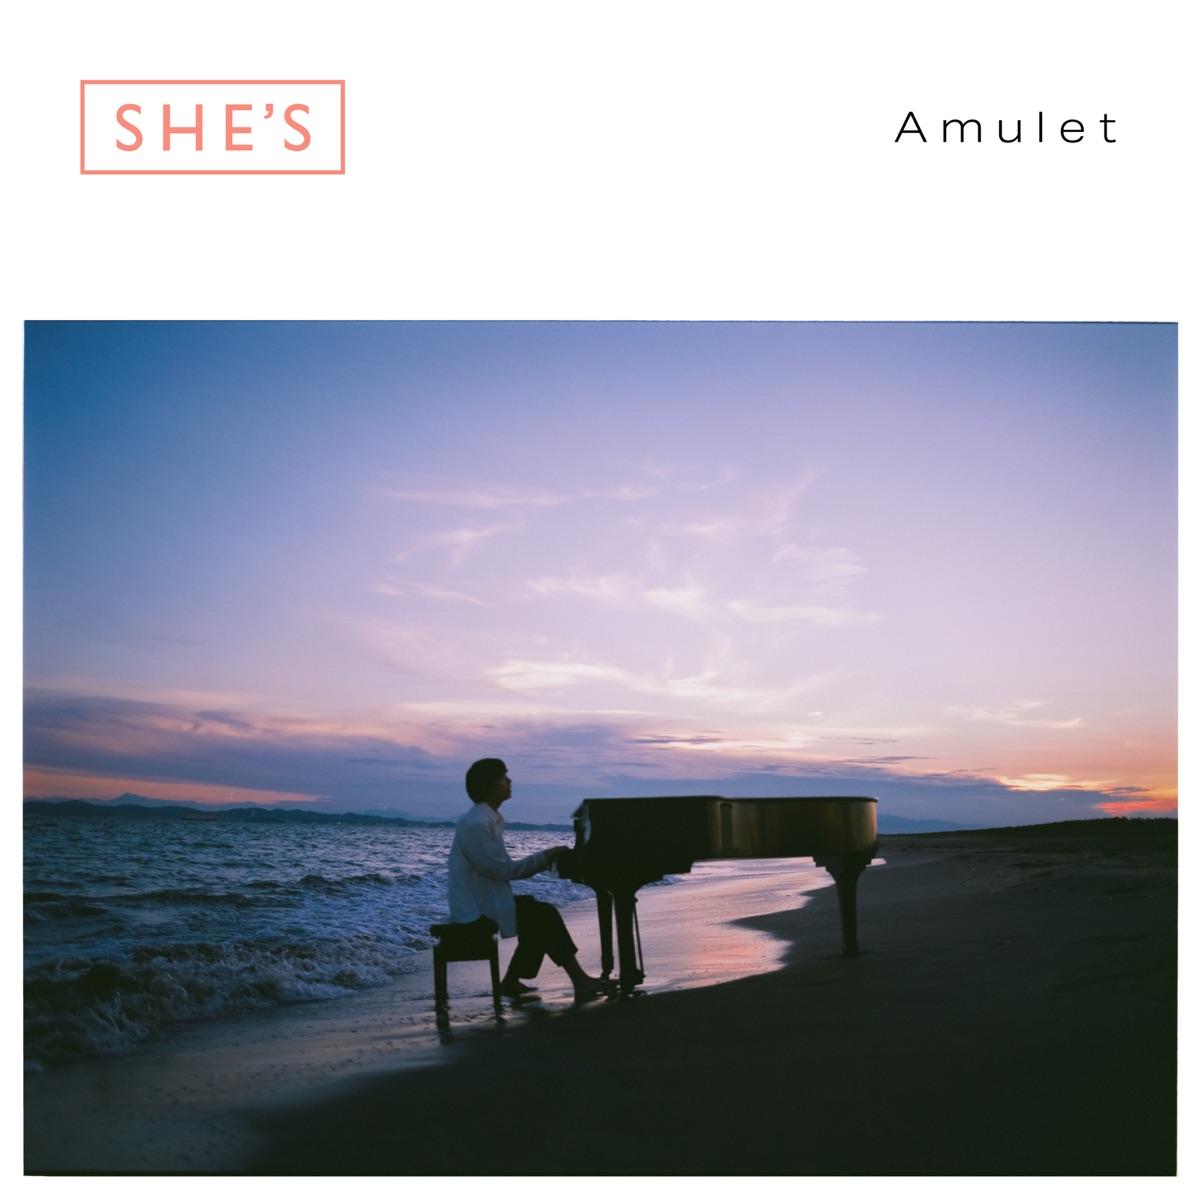 『SHE'S - Chained』収録の『Amulet』ジャケット